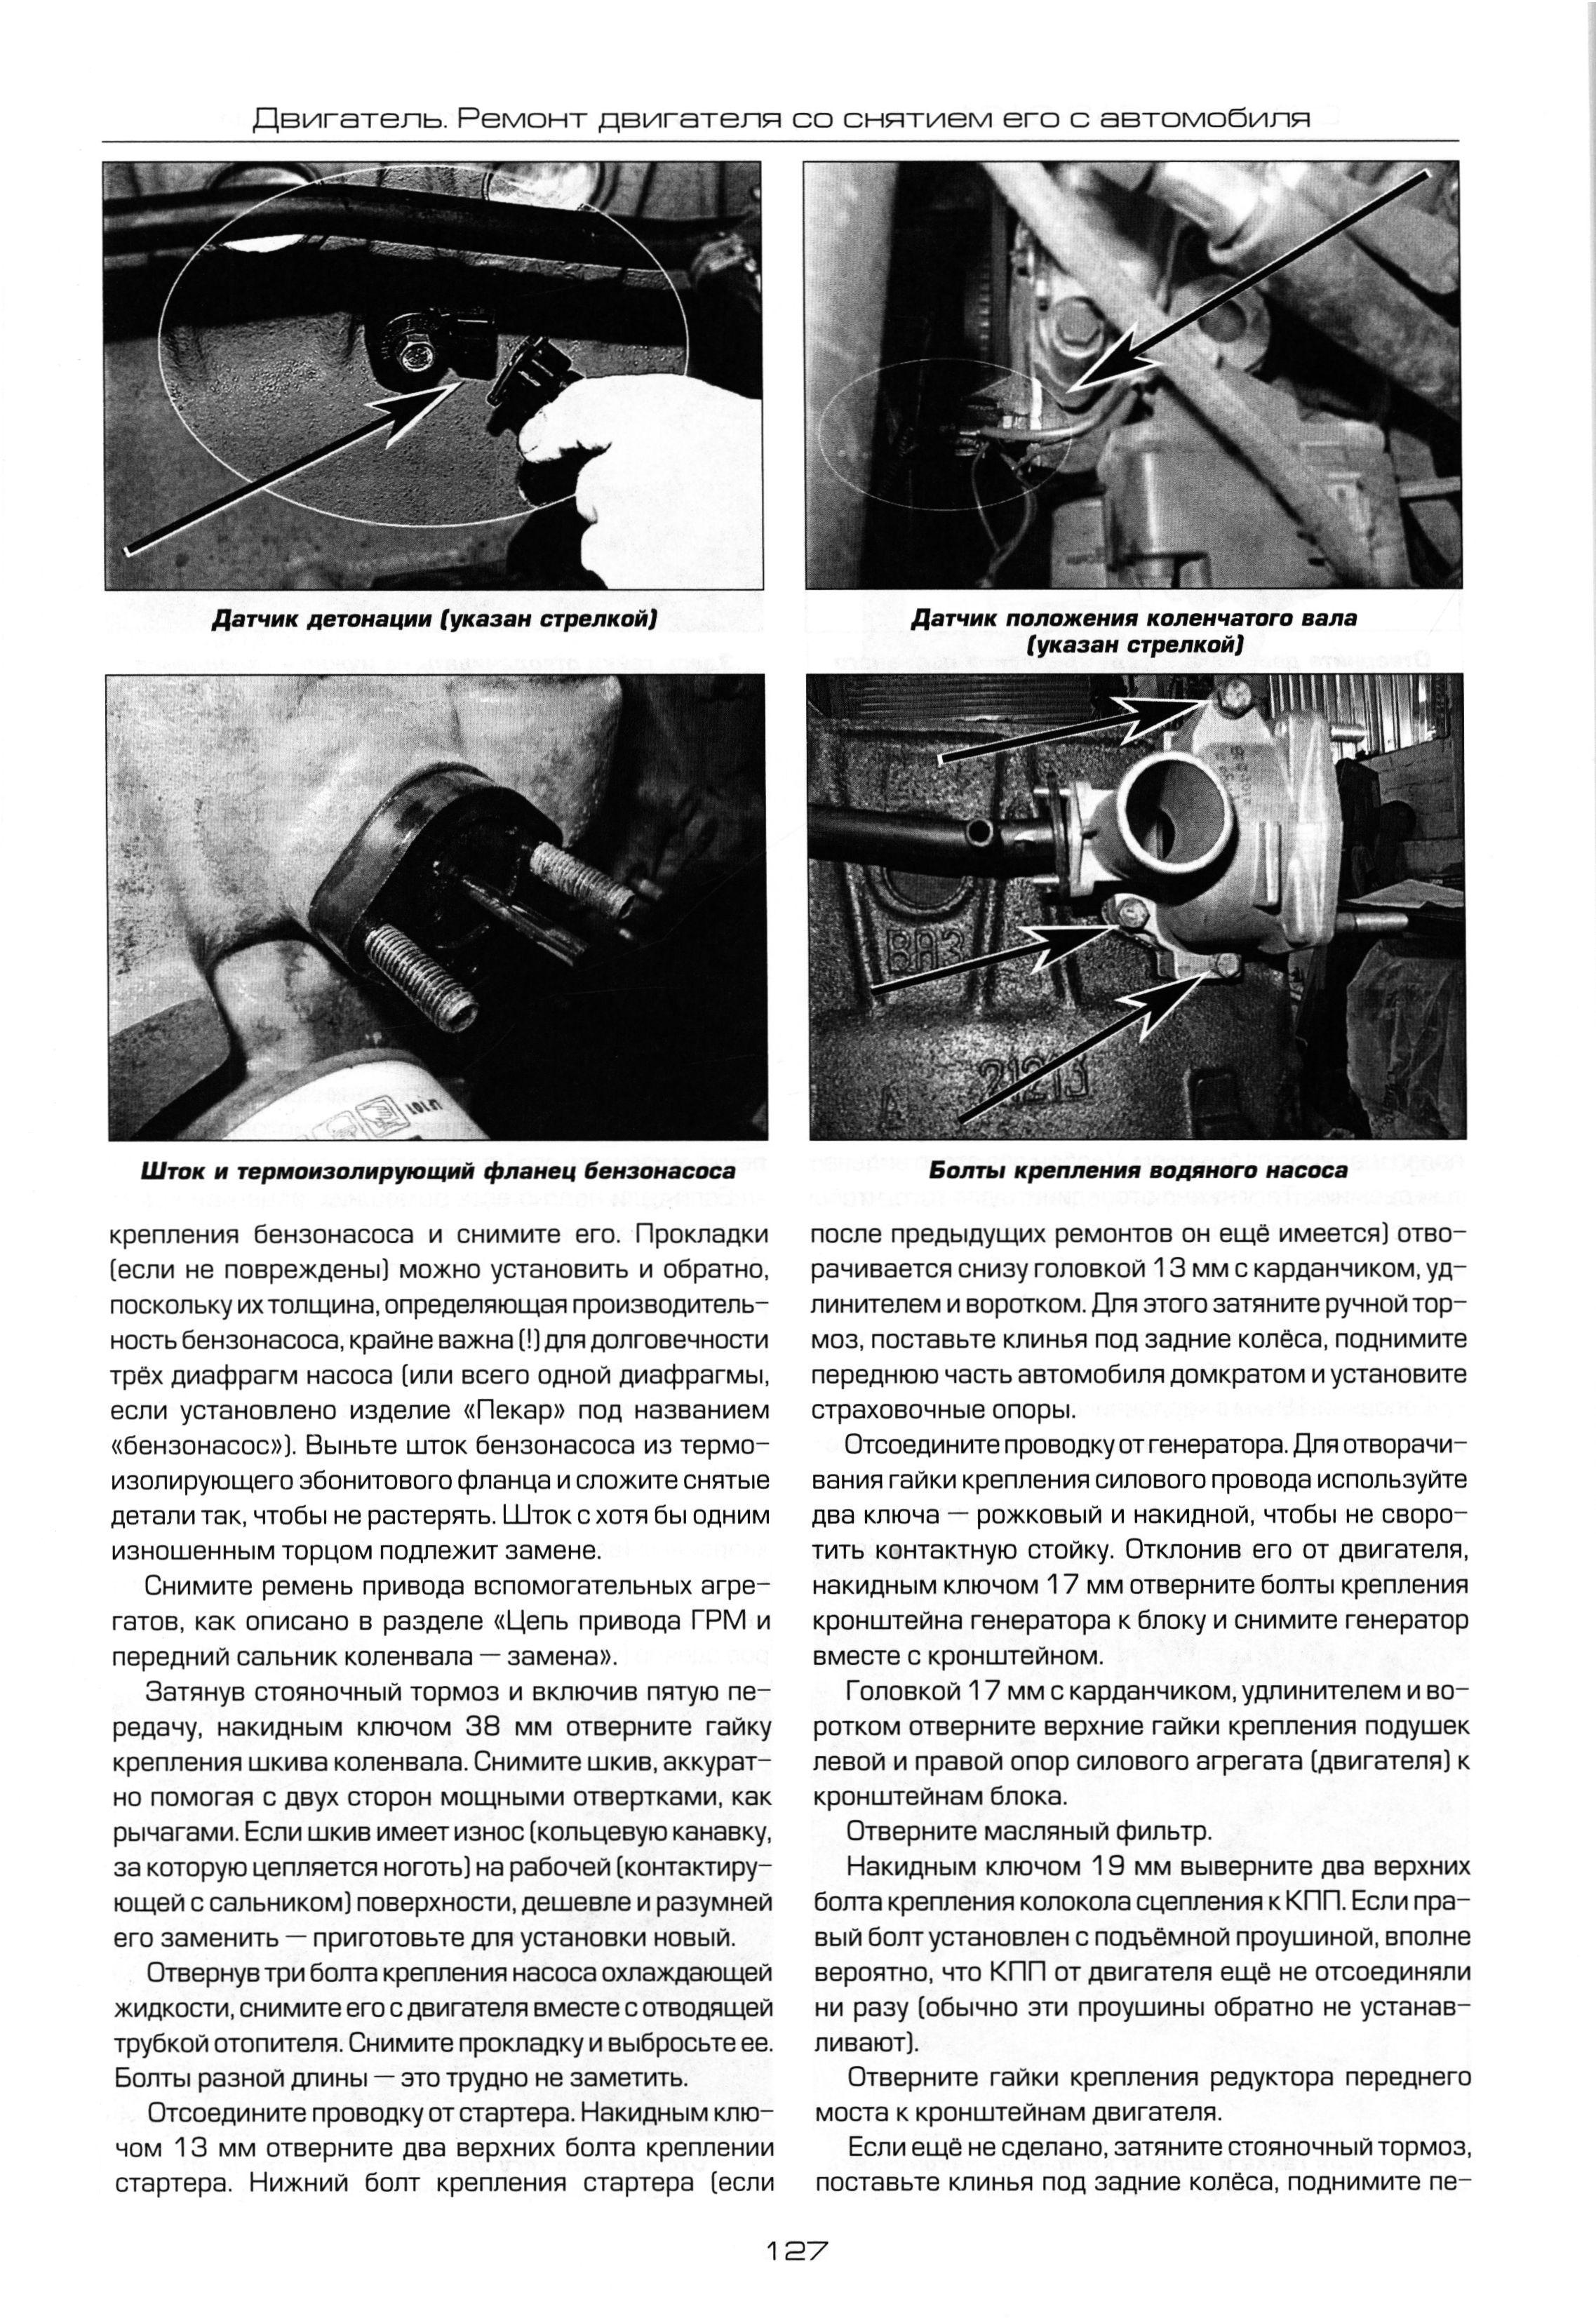 инструкция по ремонту ваз 21214 нива